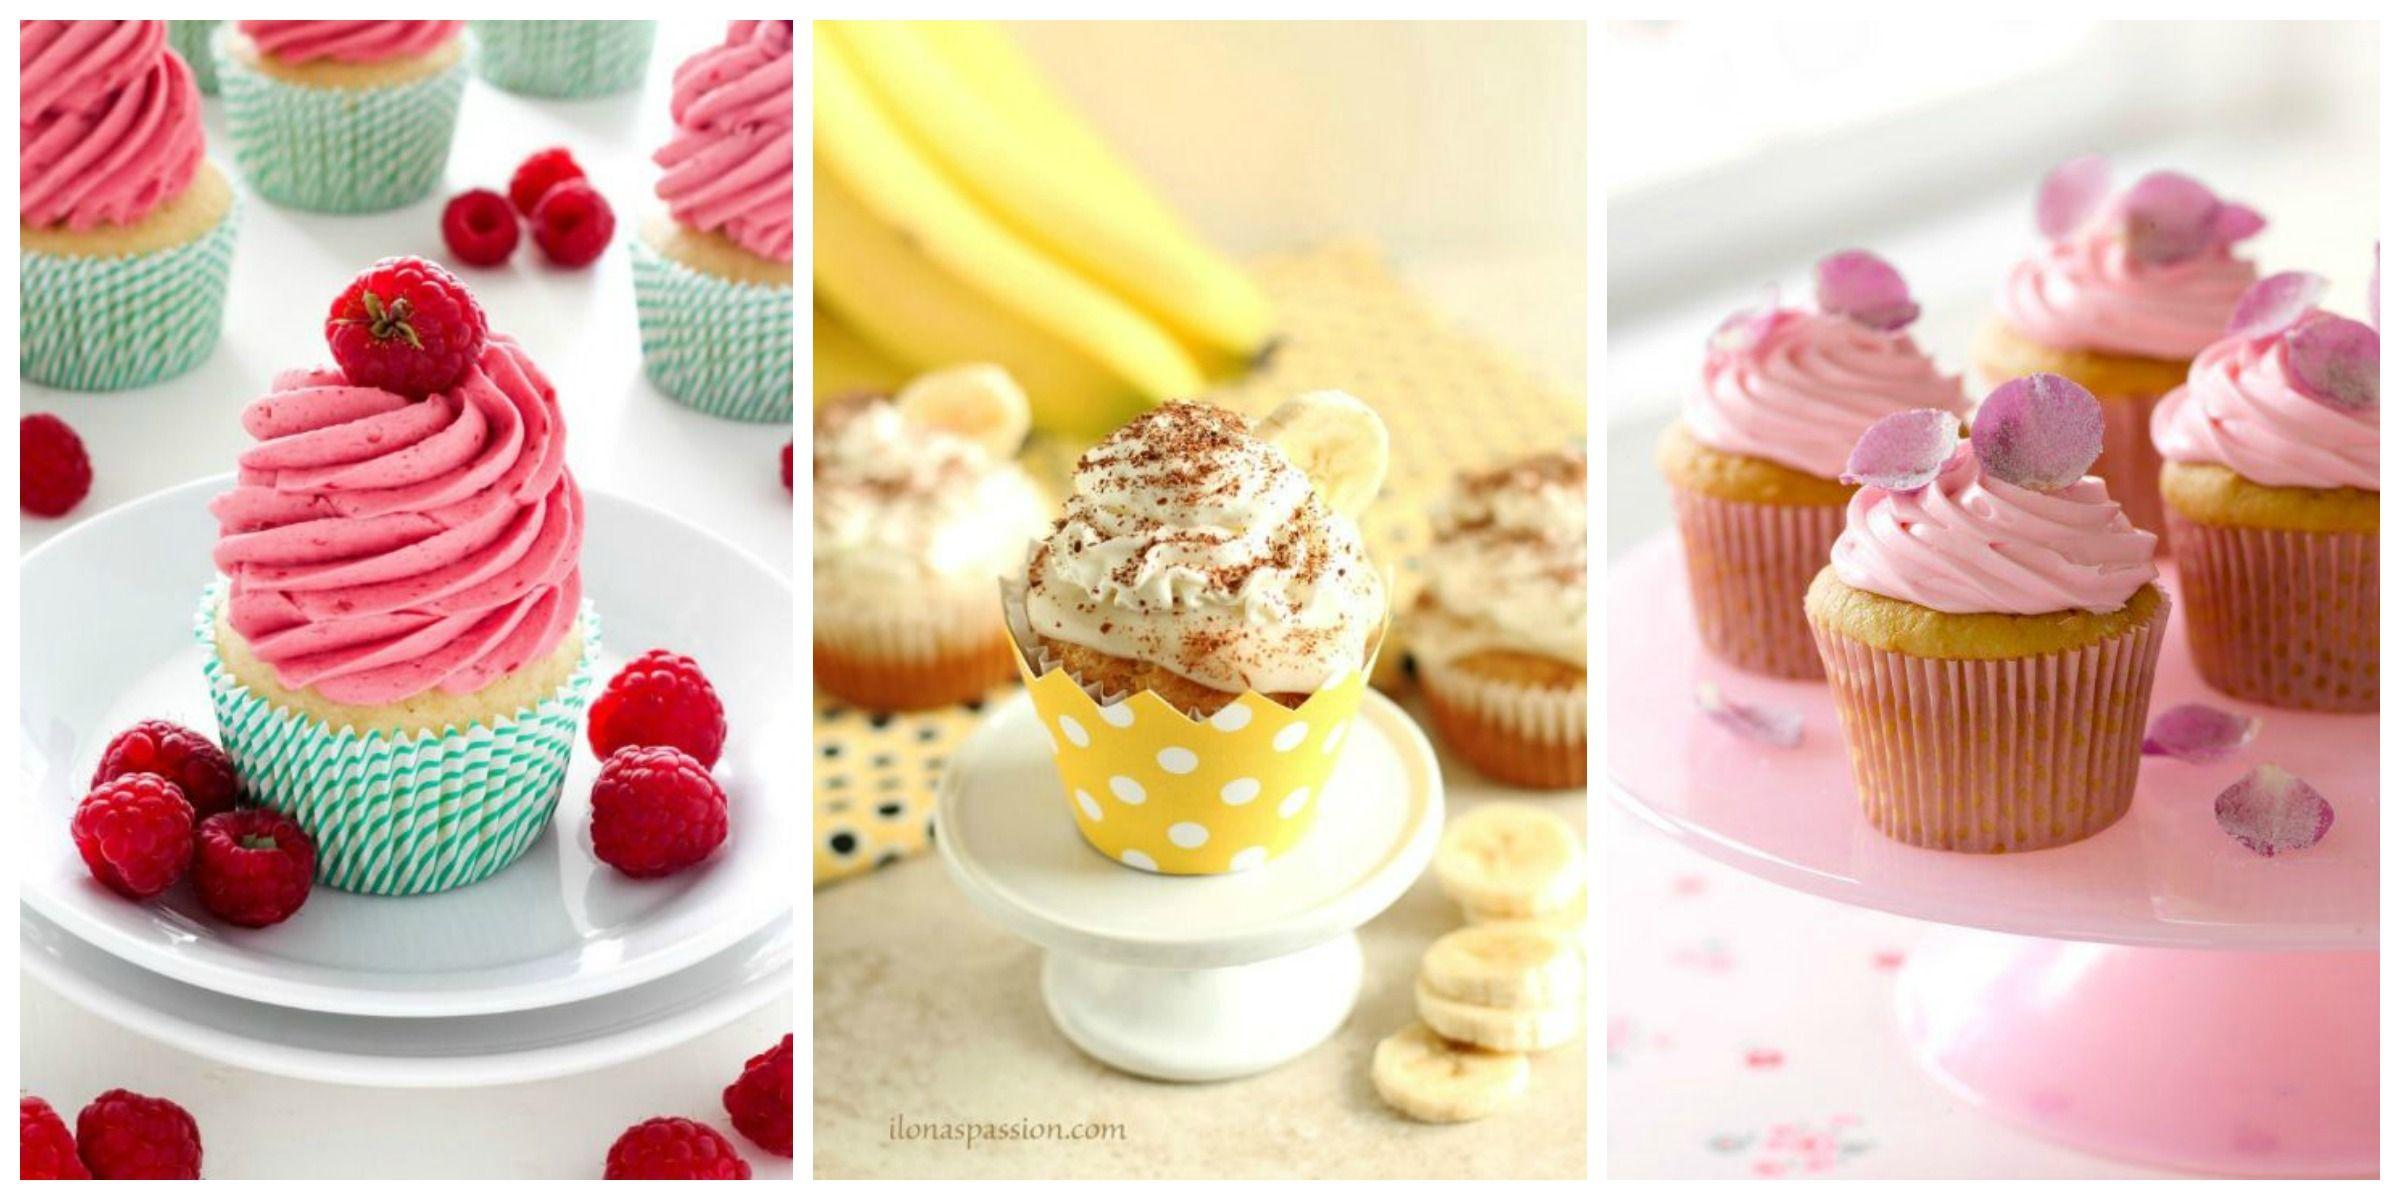 55+ Easy Cupcake Recipes - Best Cupcake Recipe Ideas